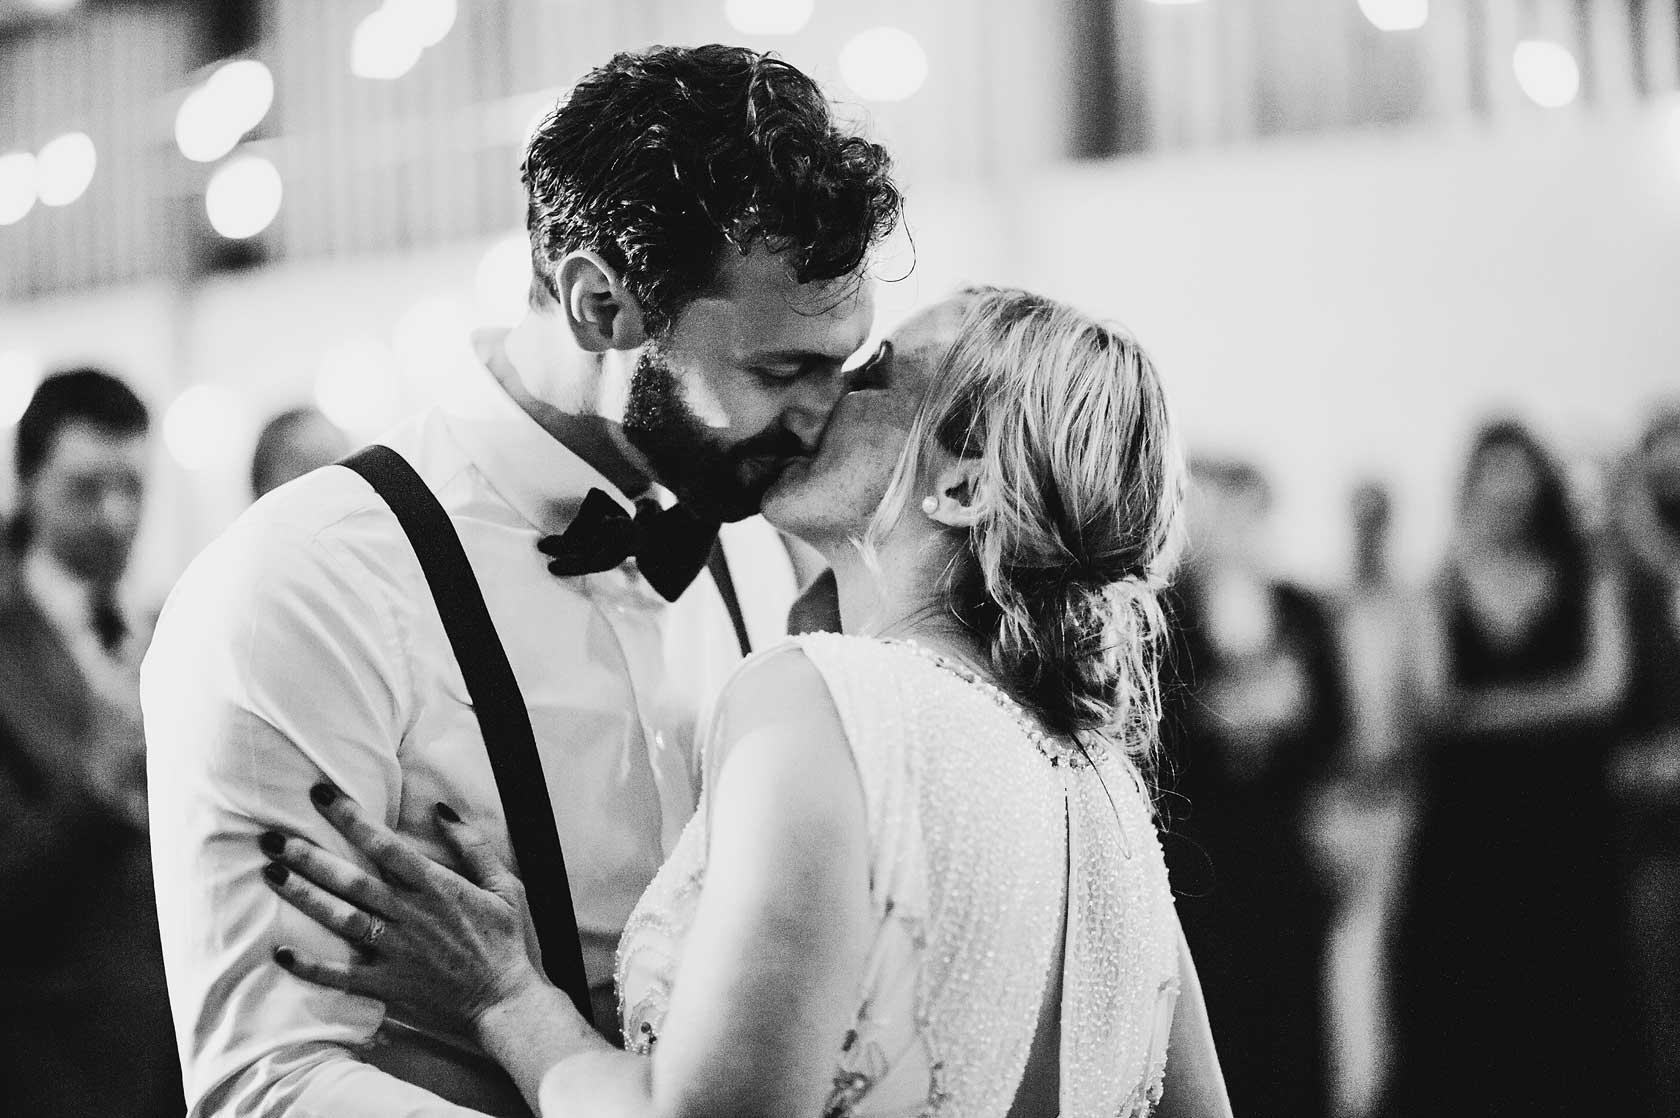 Reportage Wedding Photography at Barmbyfield Barns